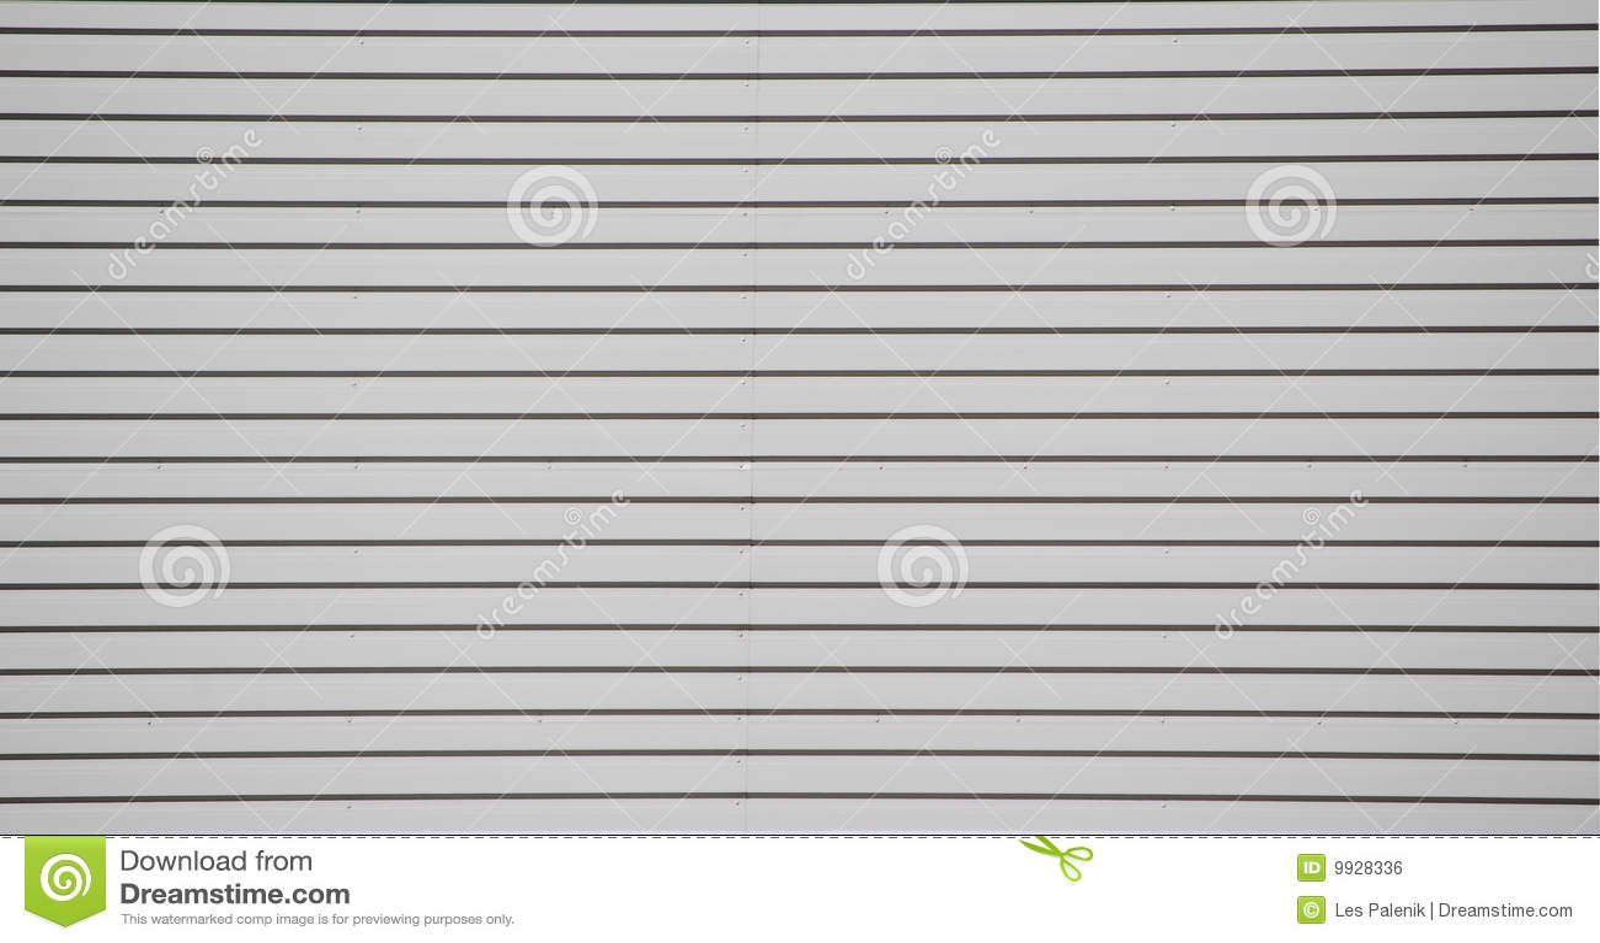 Metal wall siding pattern royalty free stock image for Horizontal steel siding